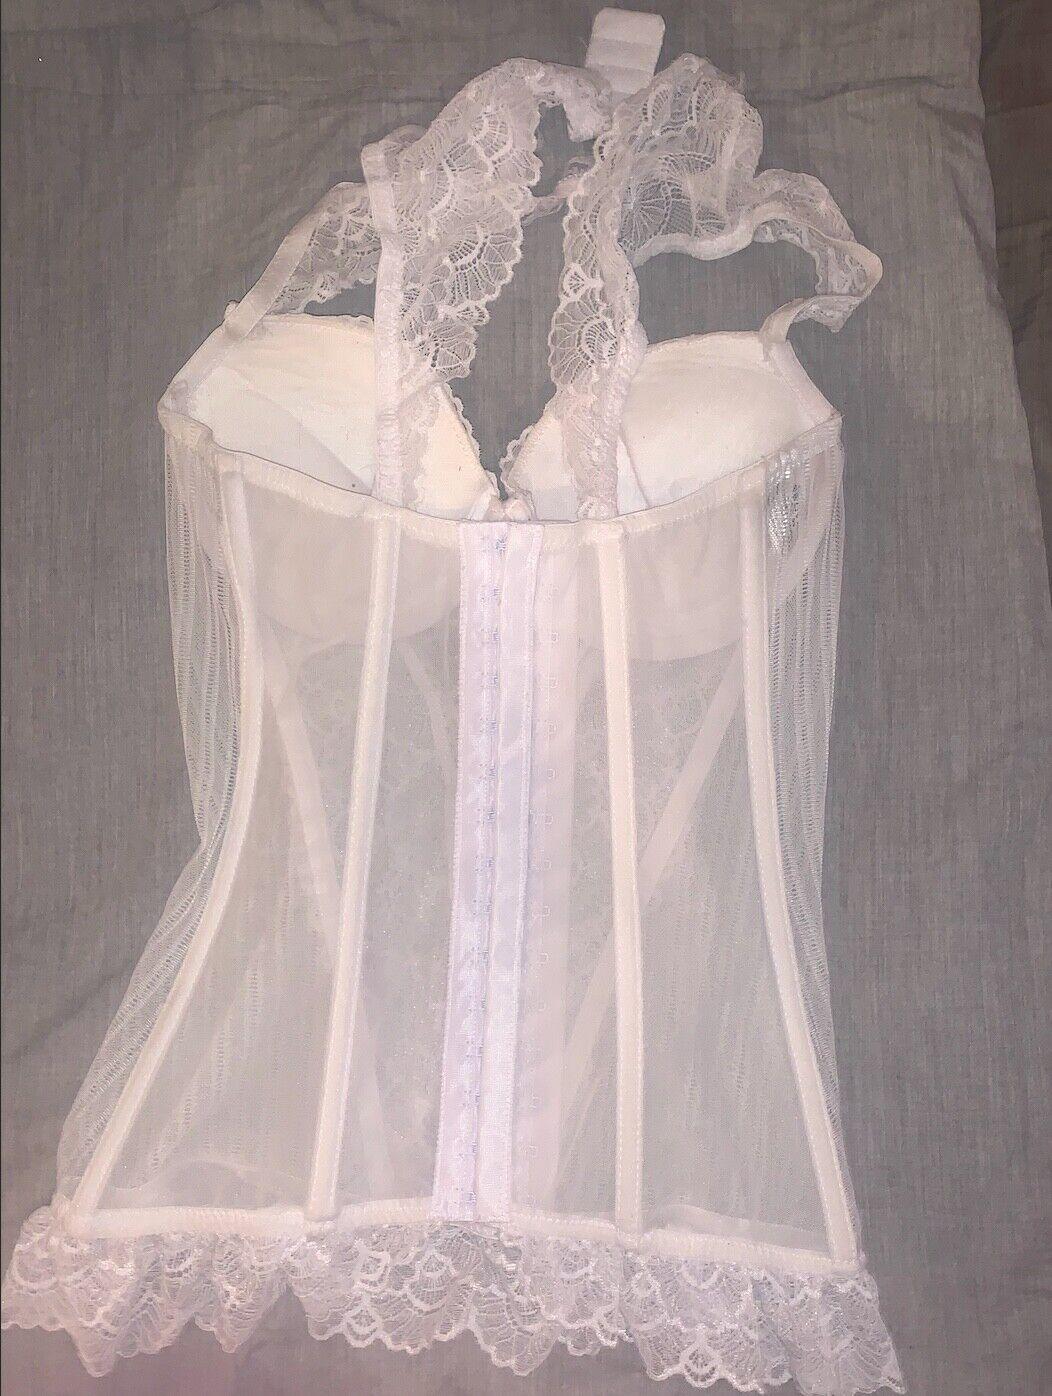 beautiful vintage white lace bustier corset - image 2